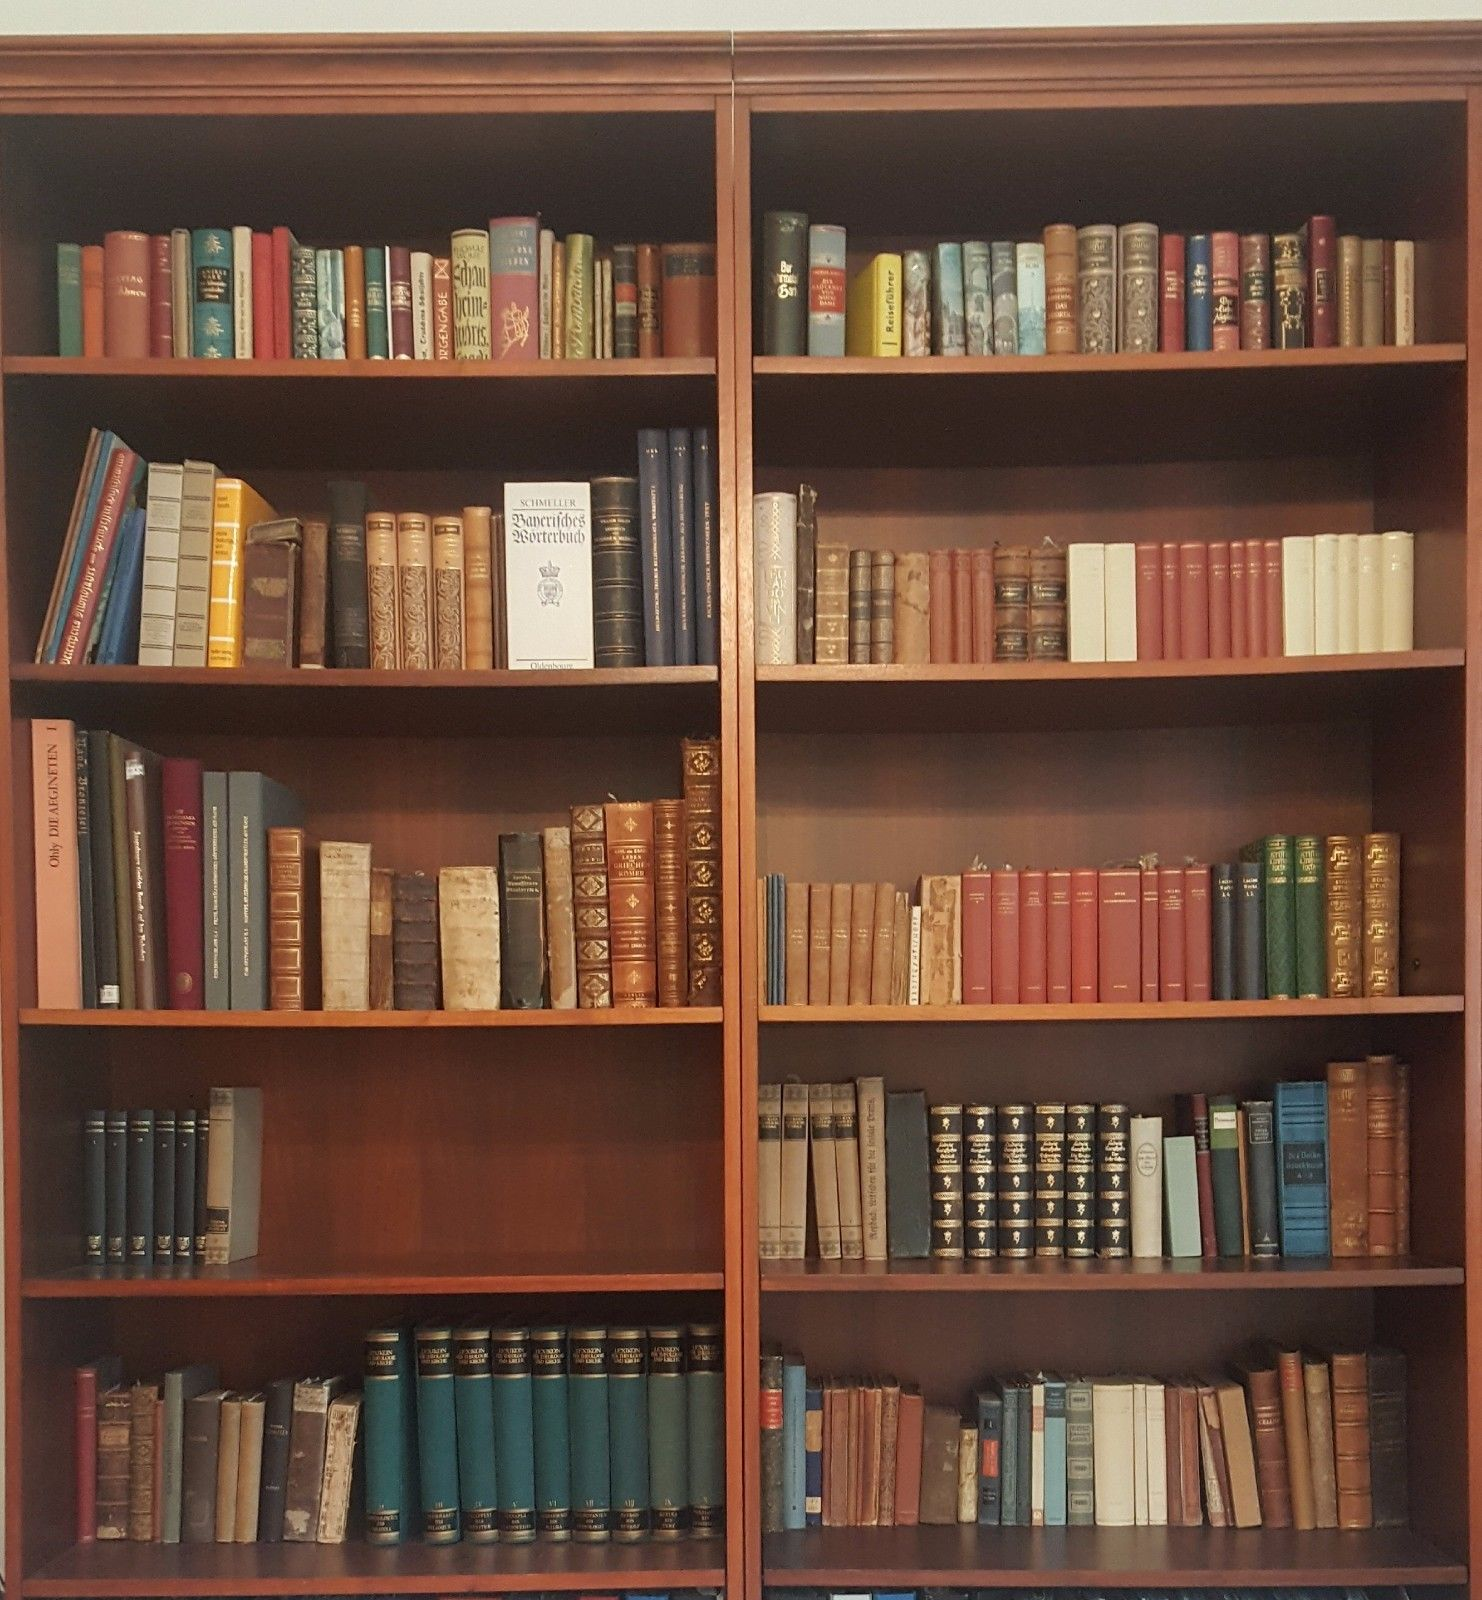 RAR - Sammlungsauflösung Konvolut Bücher Antik Seltenheiten tw. 16. Jahrhundert